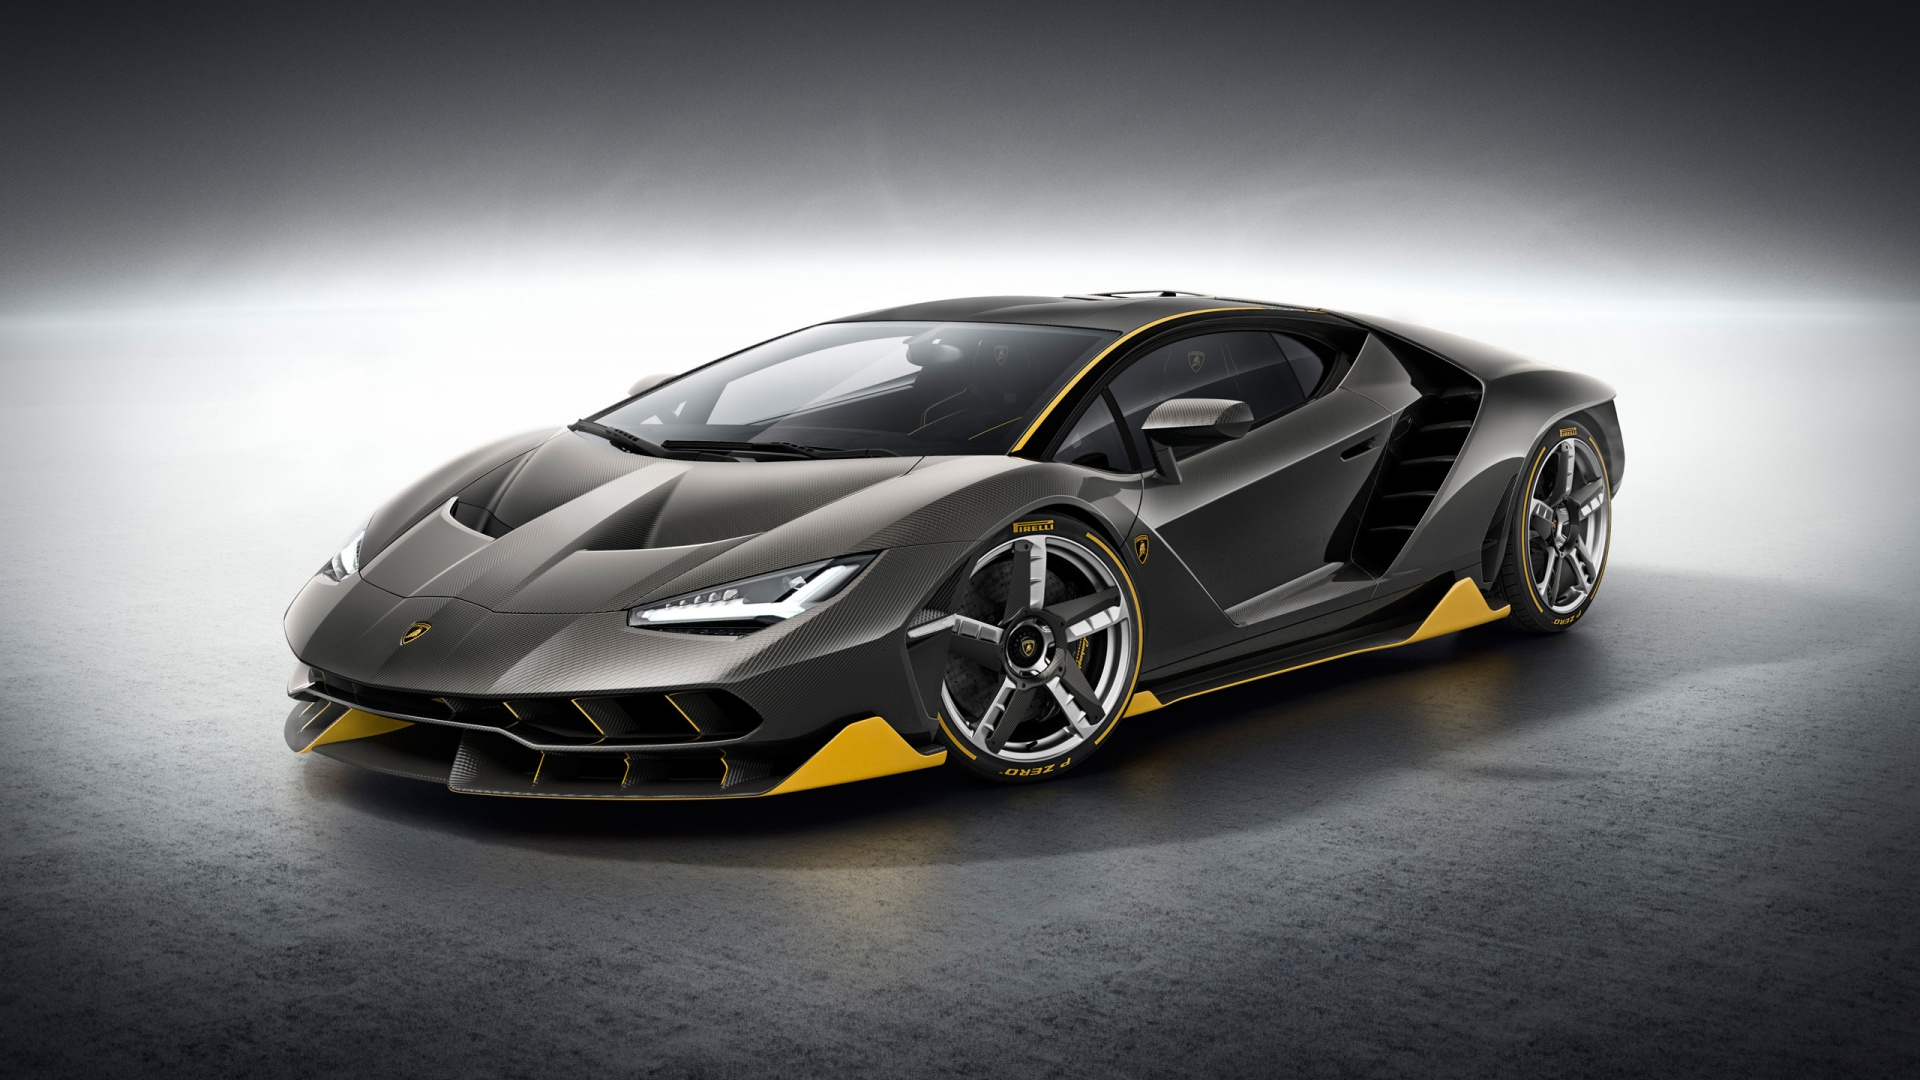 Fondos de pantalla de Lamborghini, Wallpapers HD Gratis